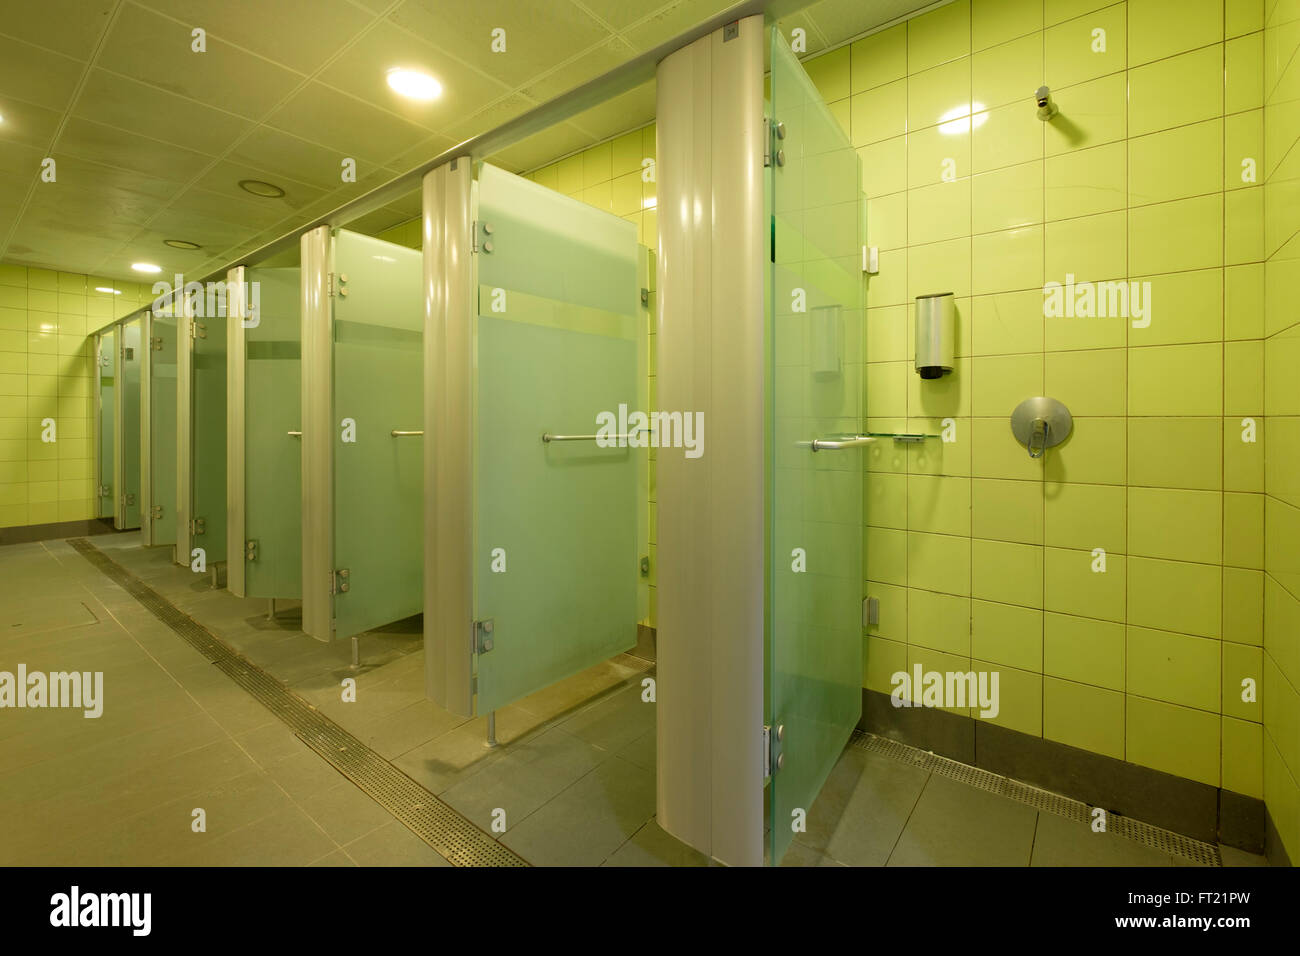 Communal showers stock photos